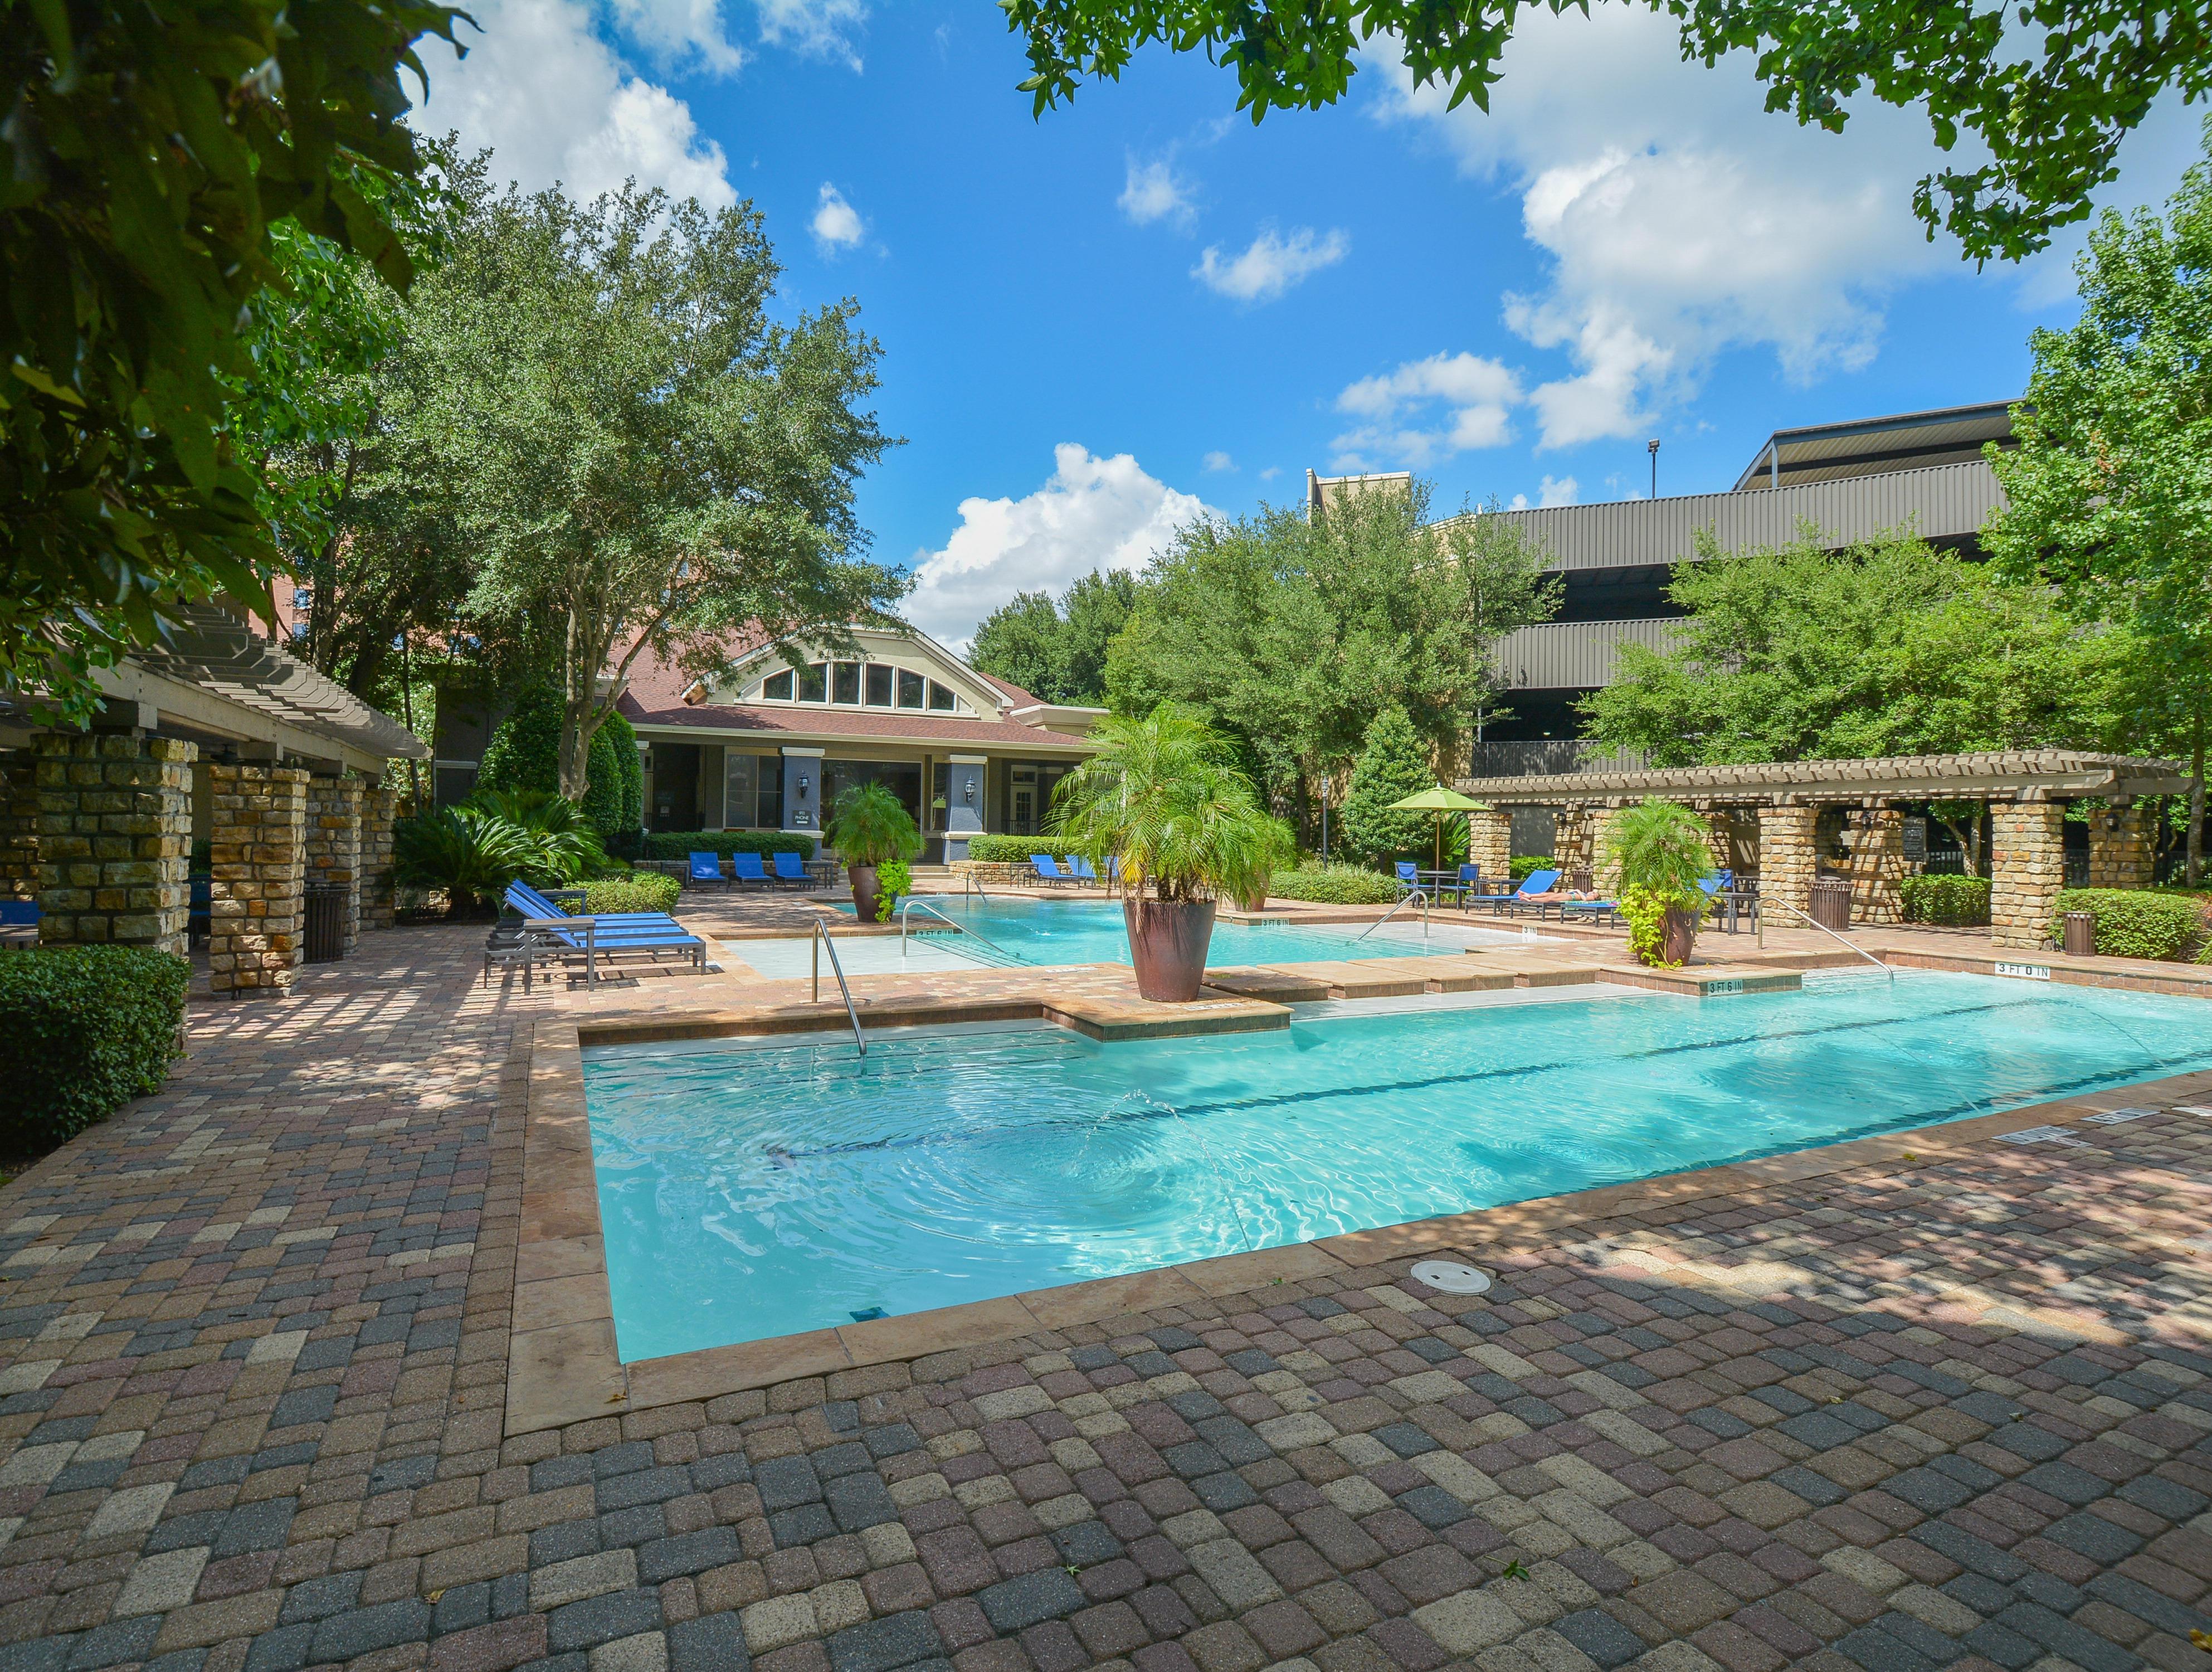 Villas At Hermann Park In Houston Tx 77021